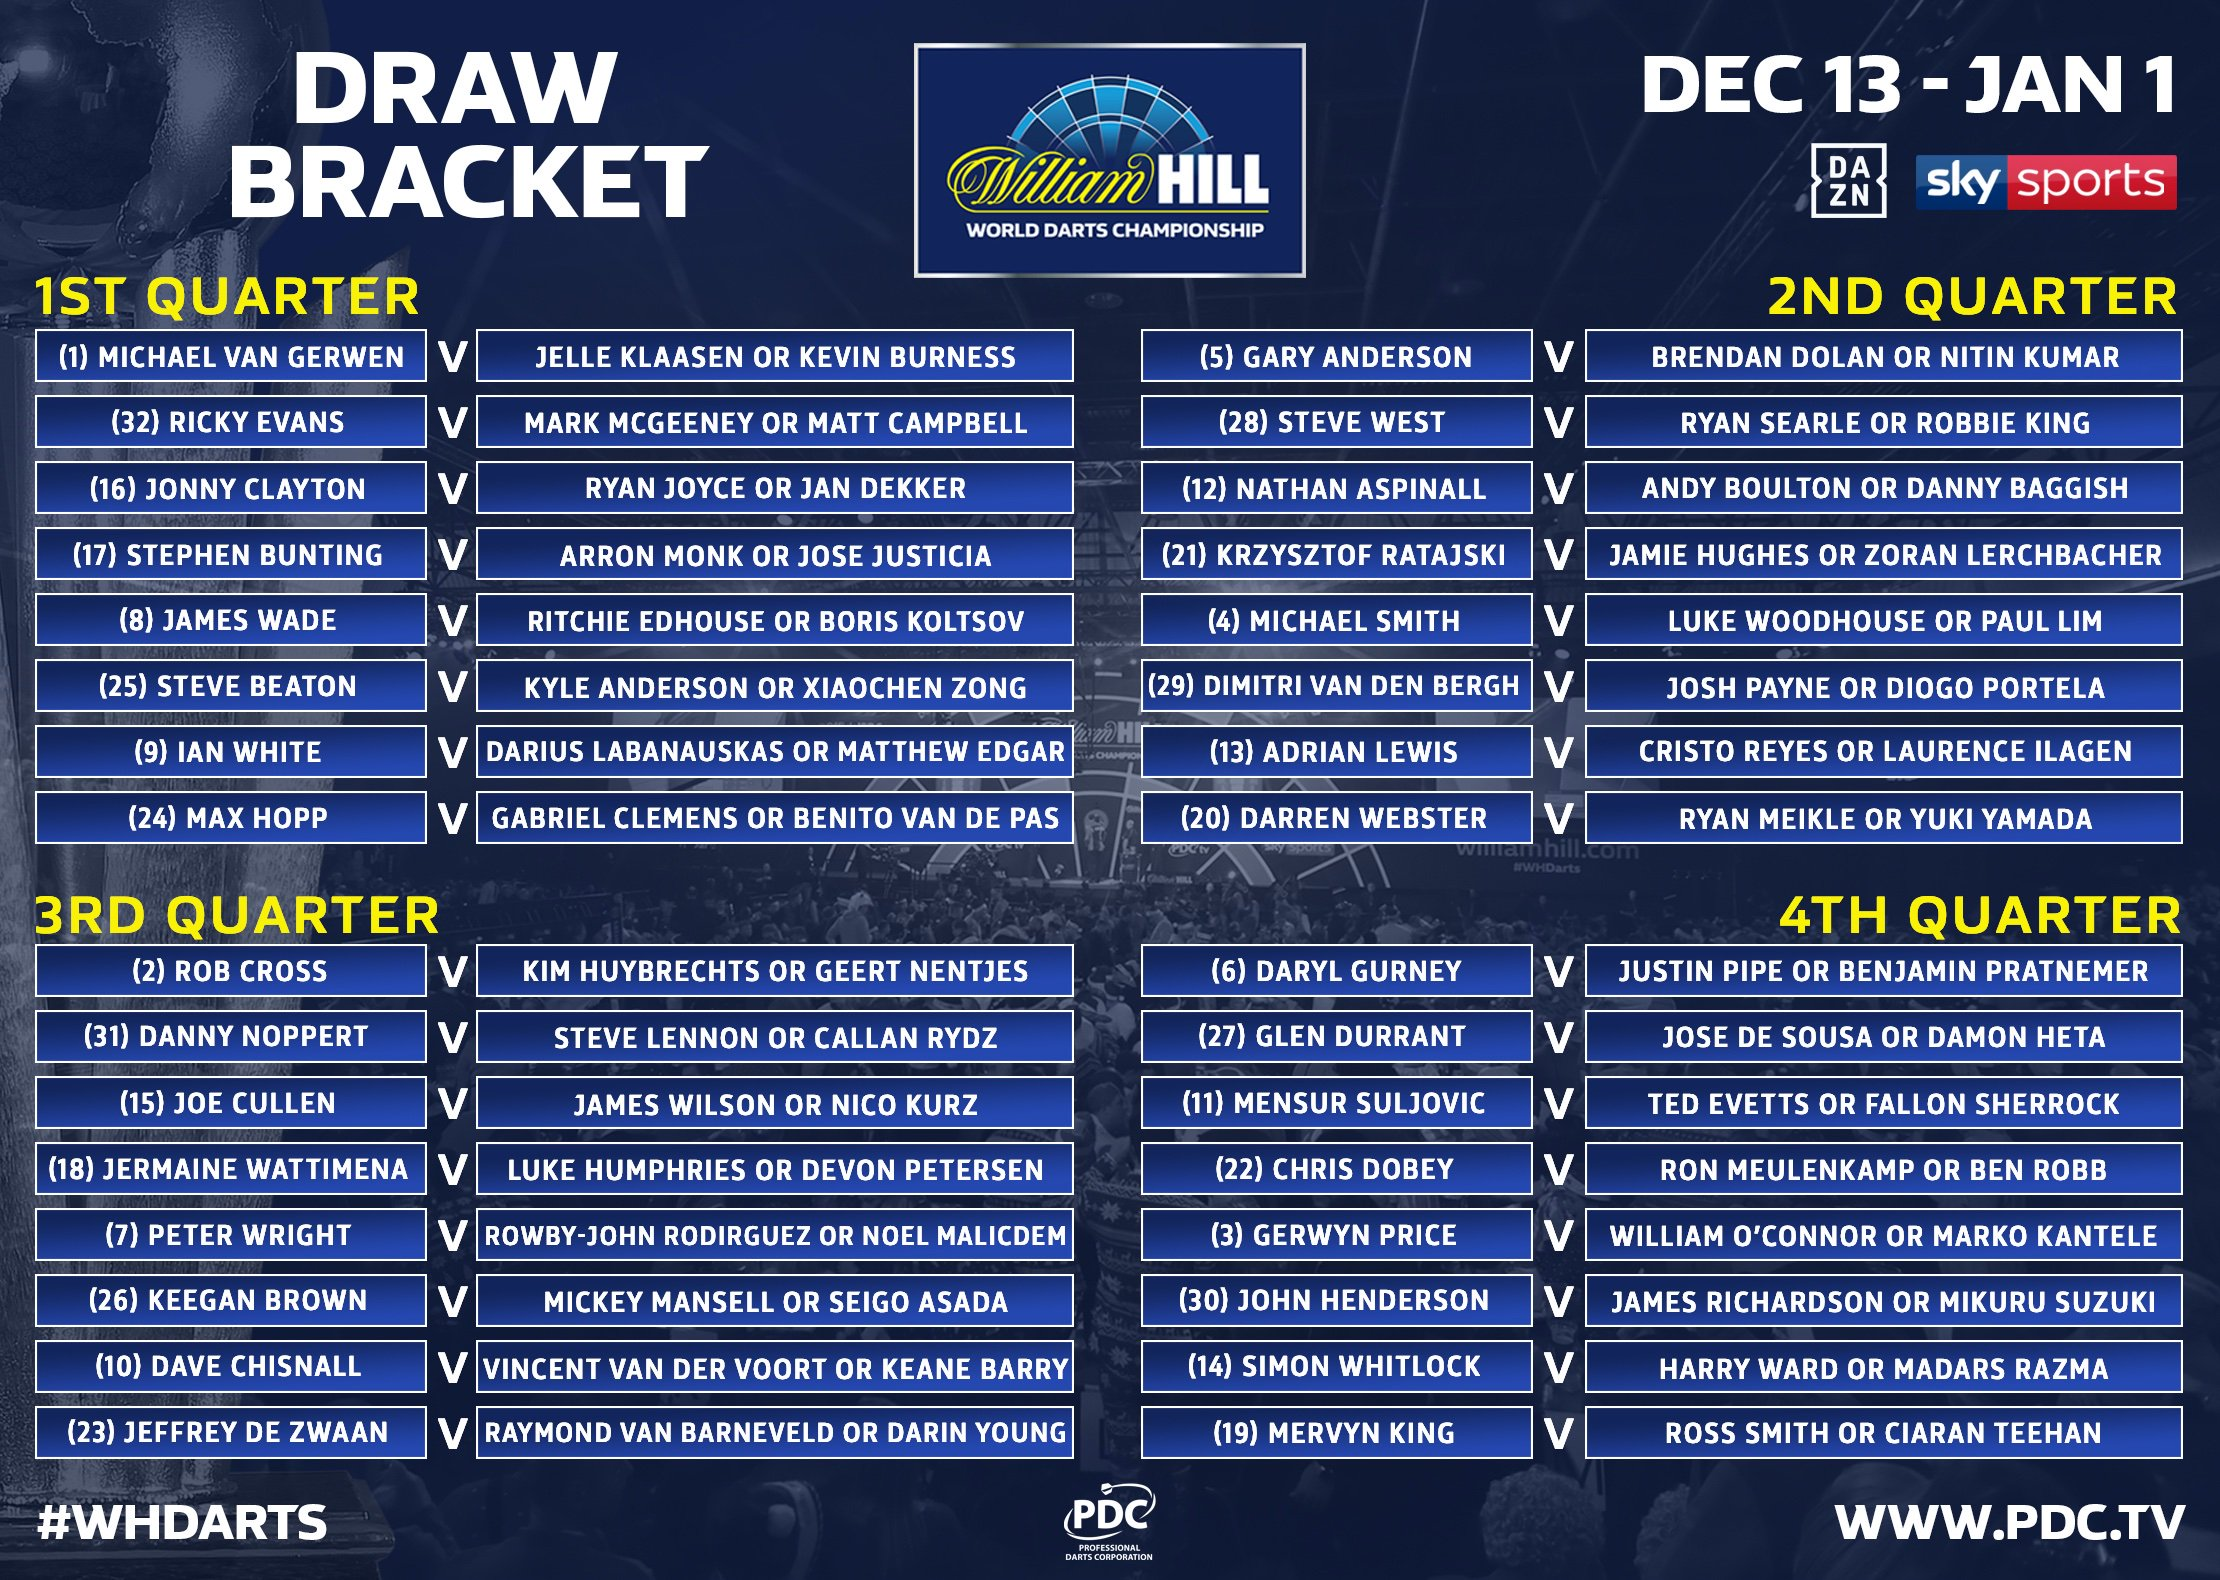 World Championship draw bracket (PDC)